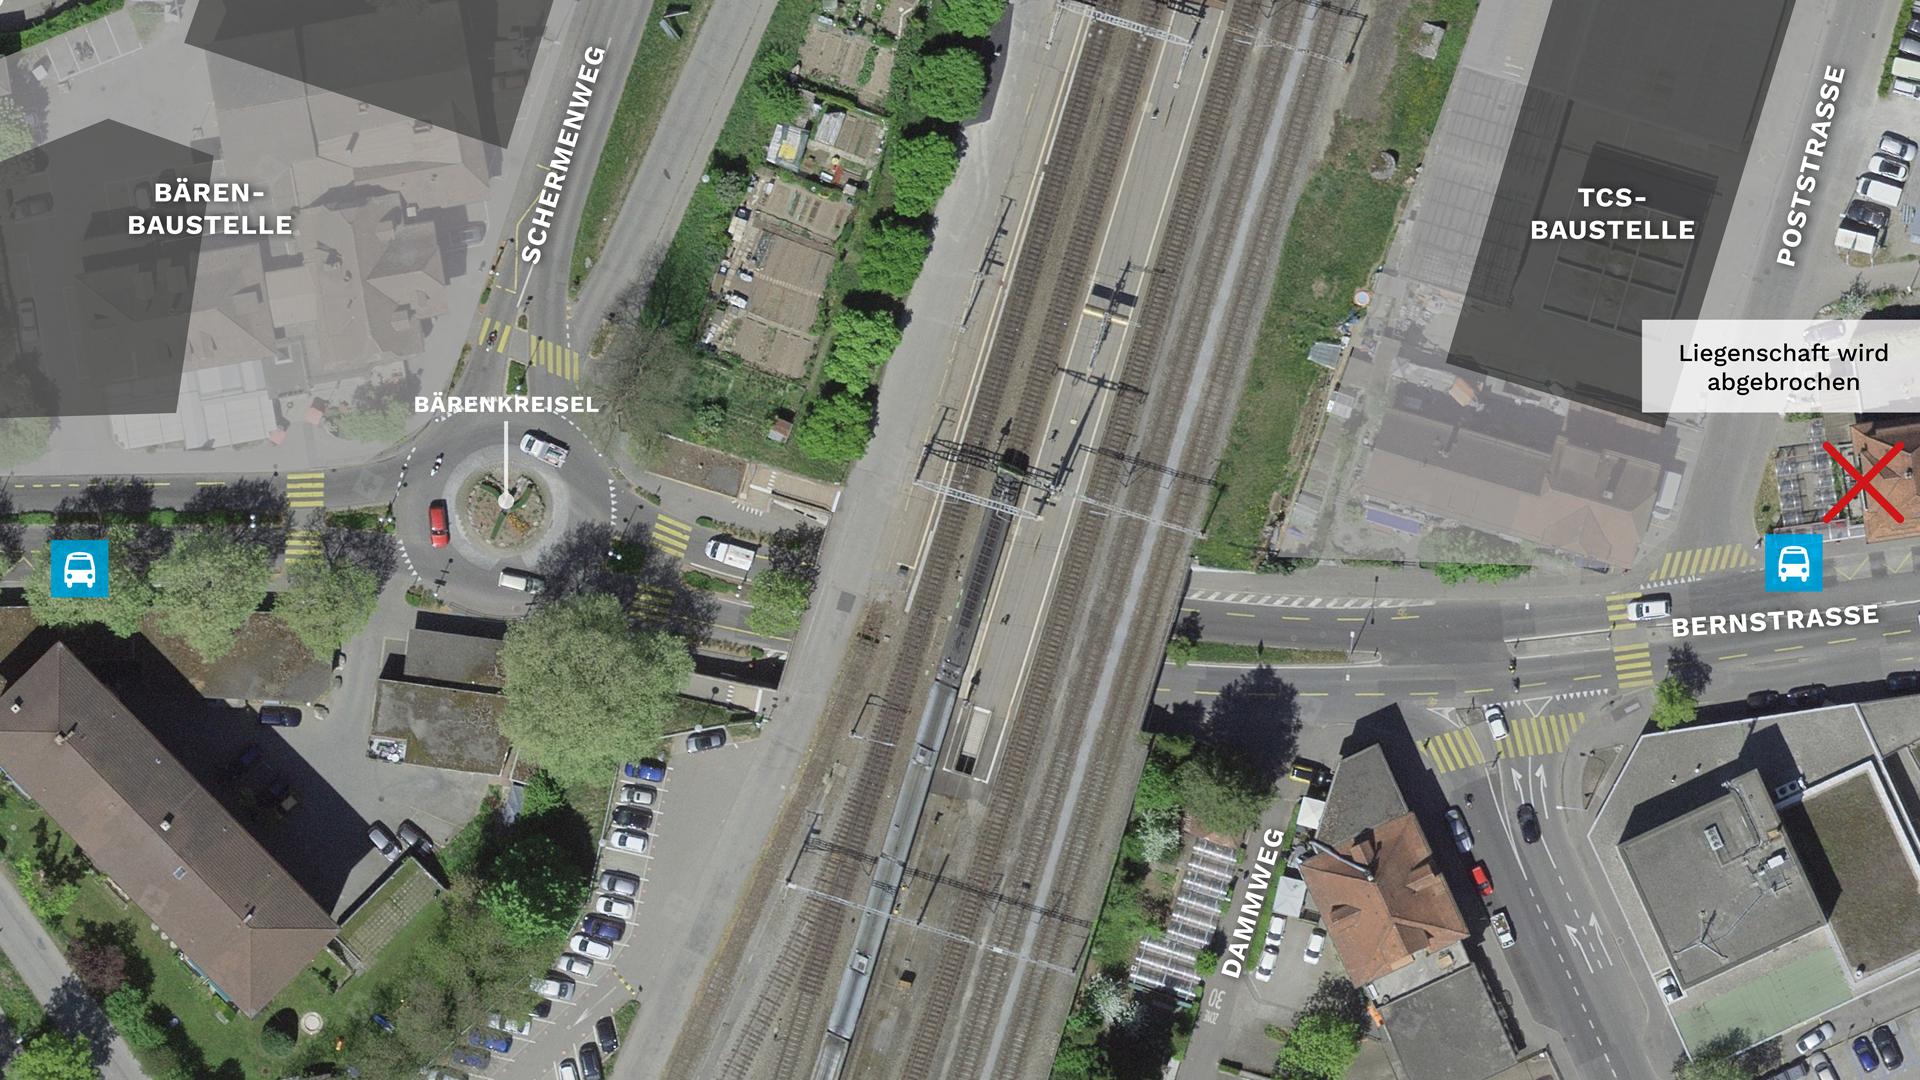 ÖV-Umsteigeknoten Bahnhof Ostermundigen